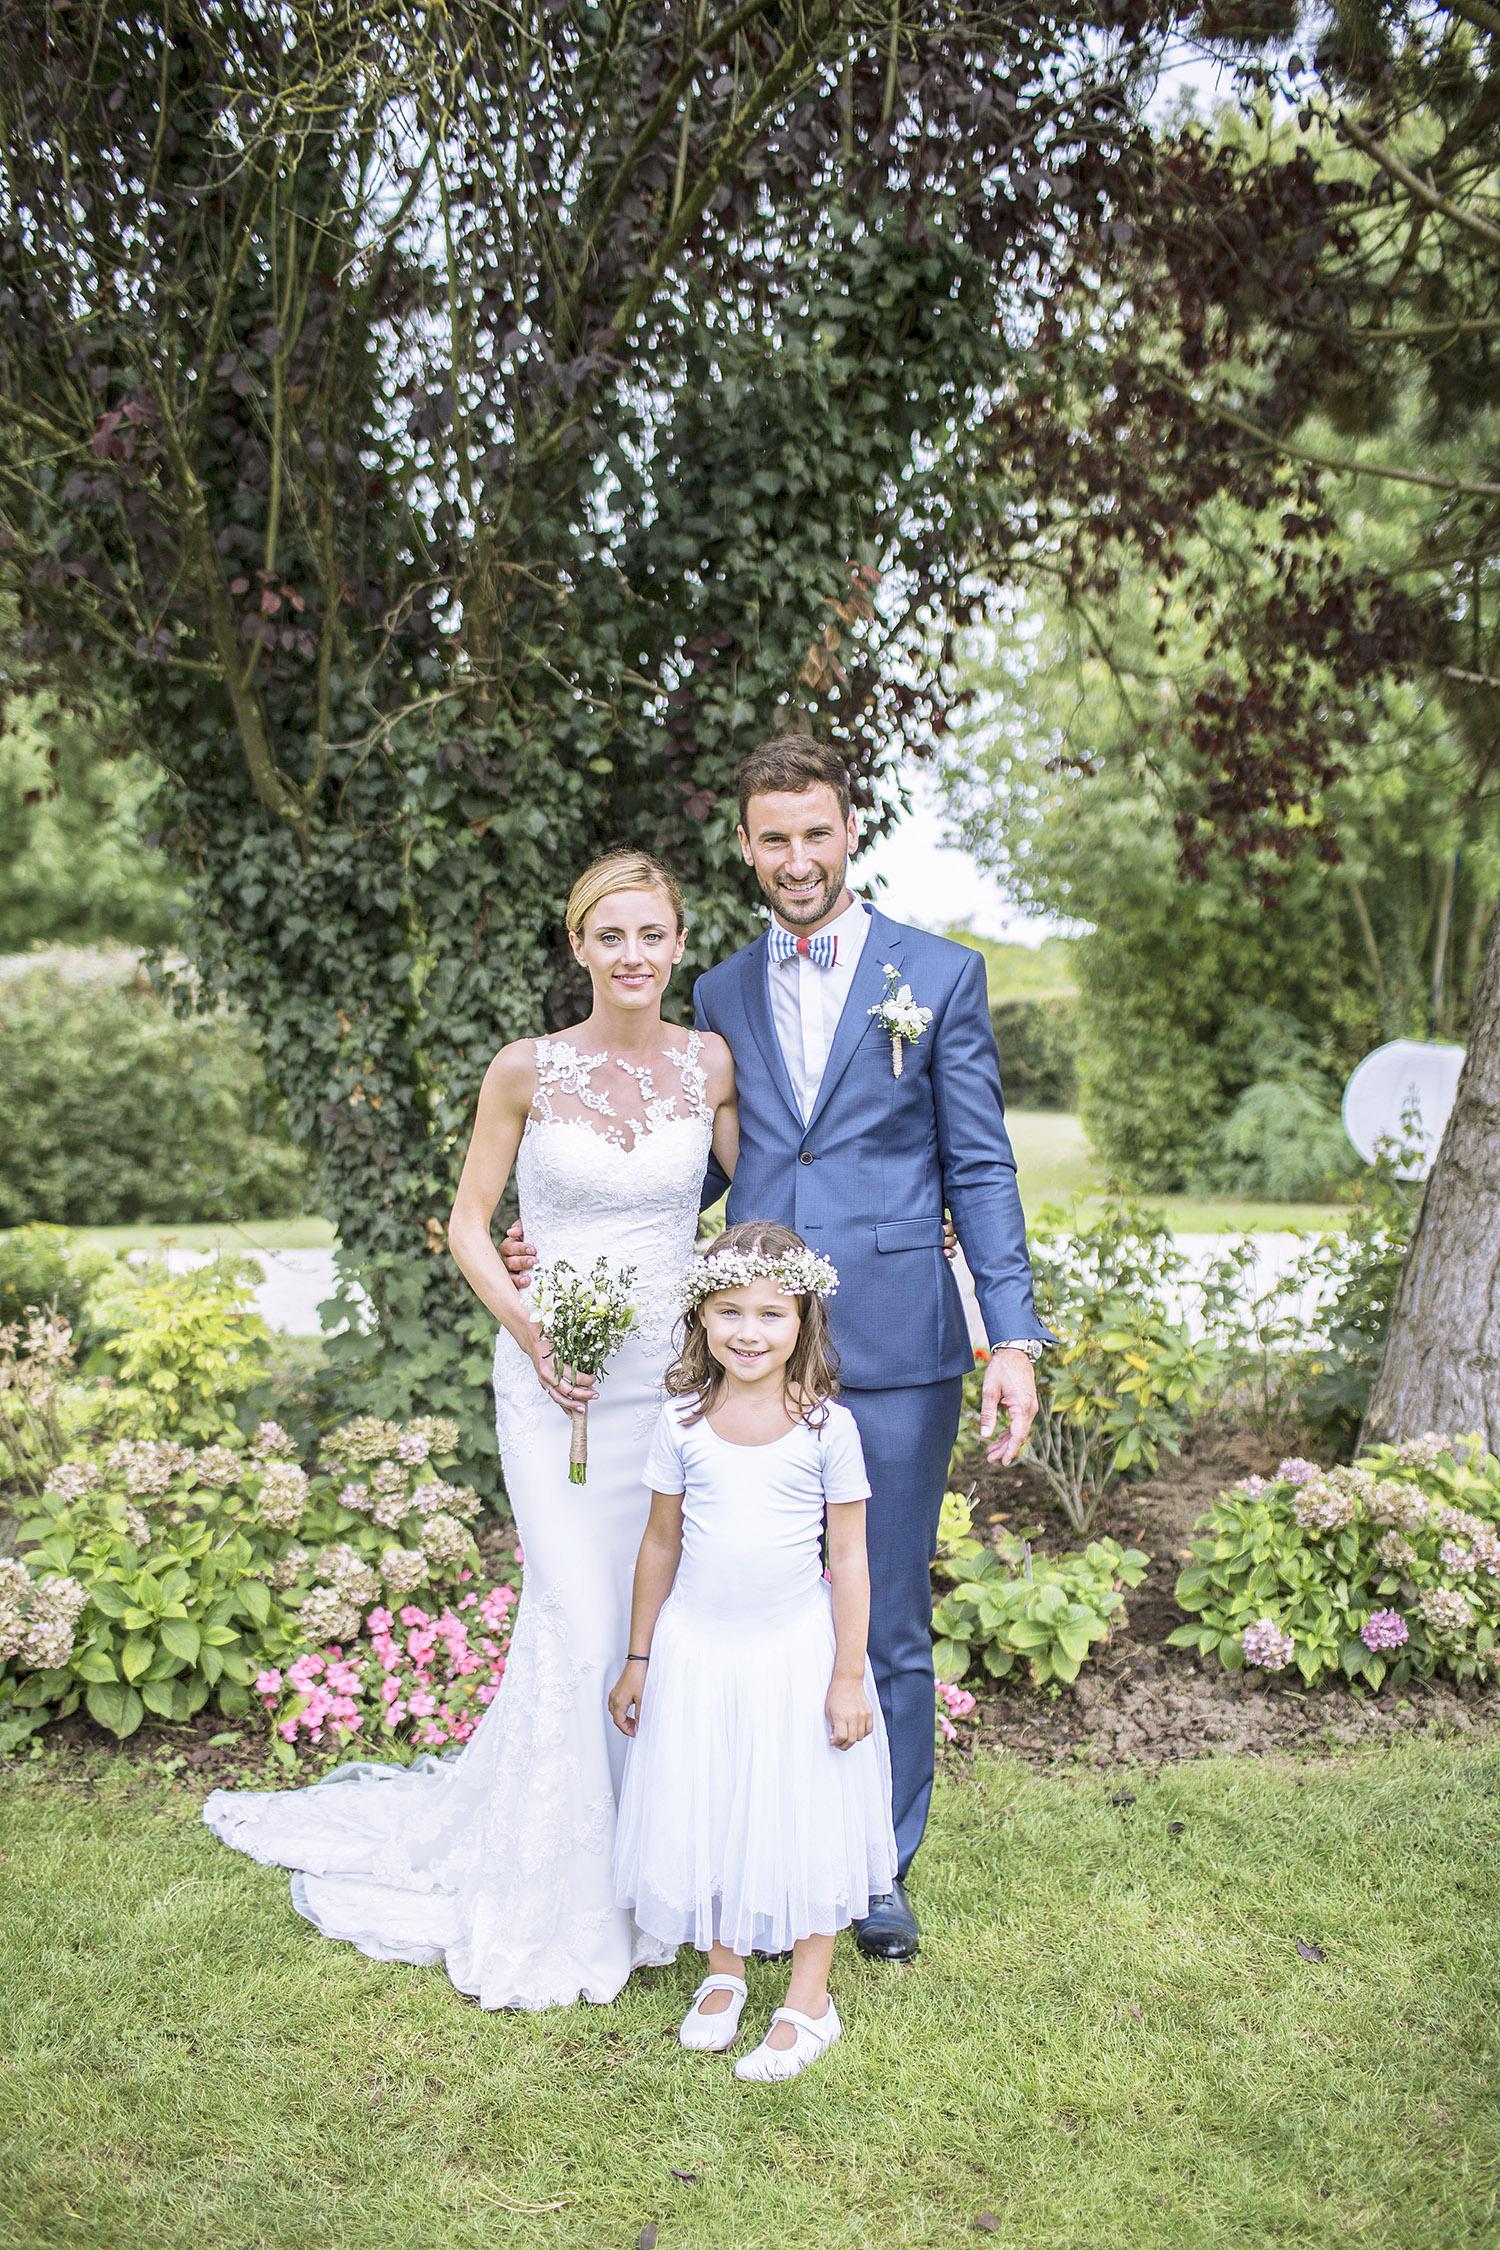 mariage-champetre-photos-album-famille